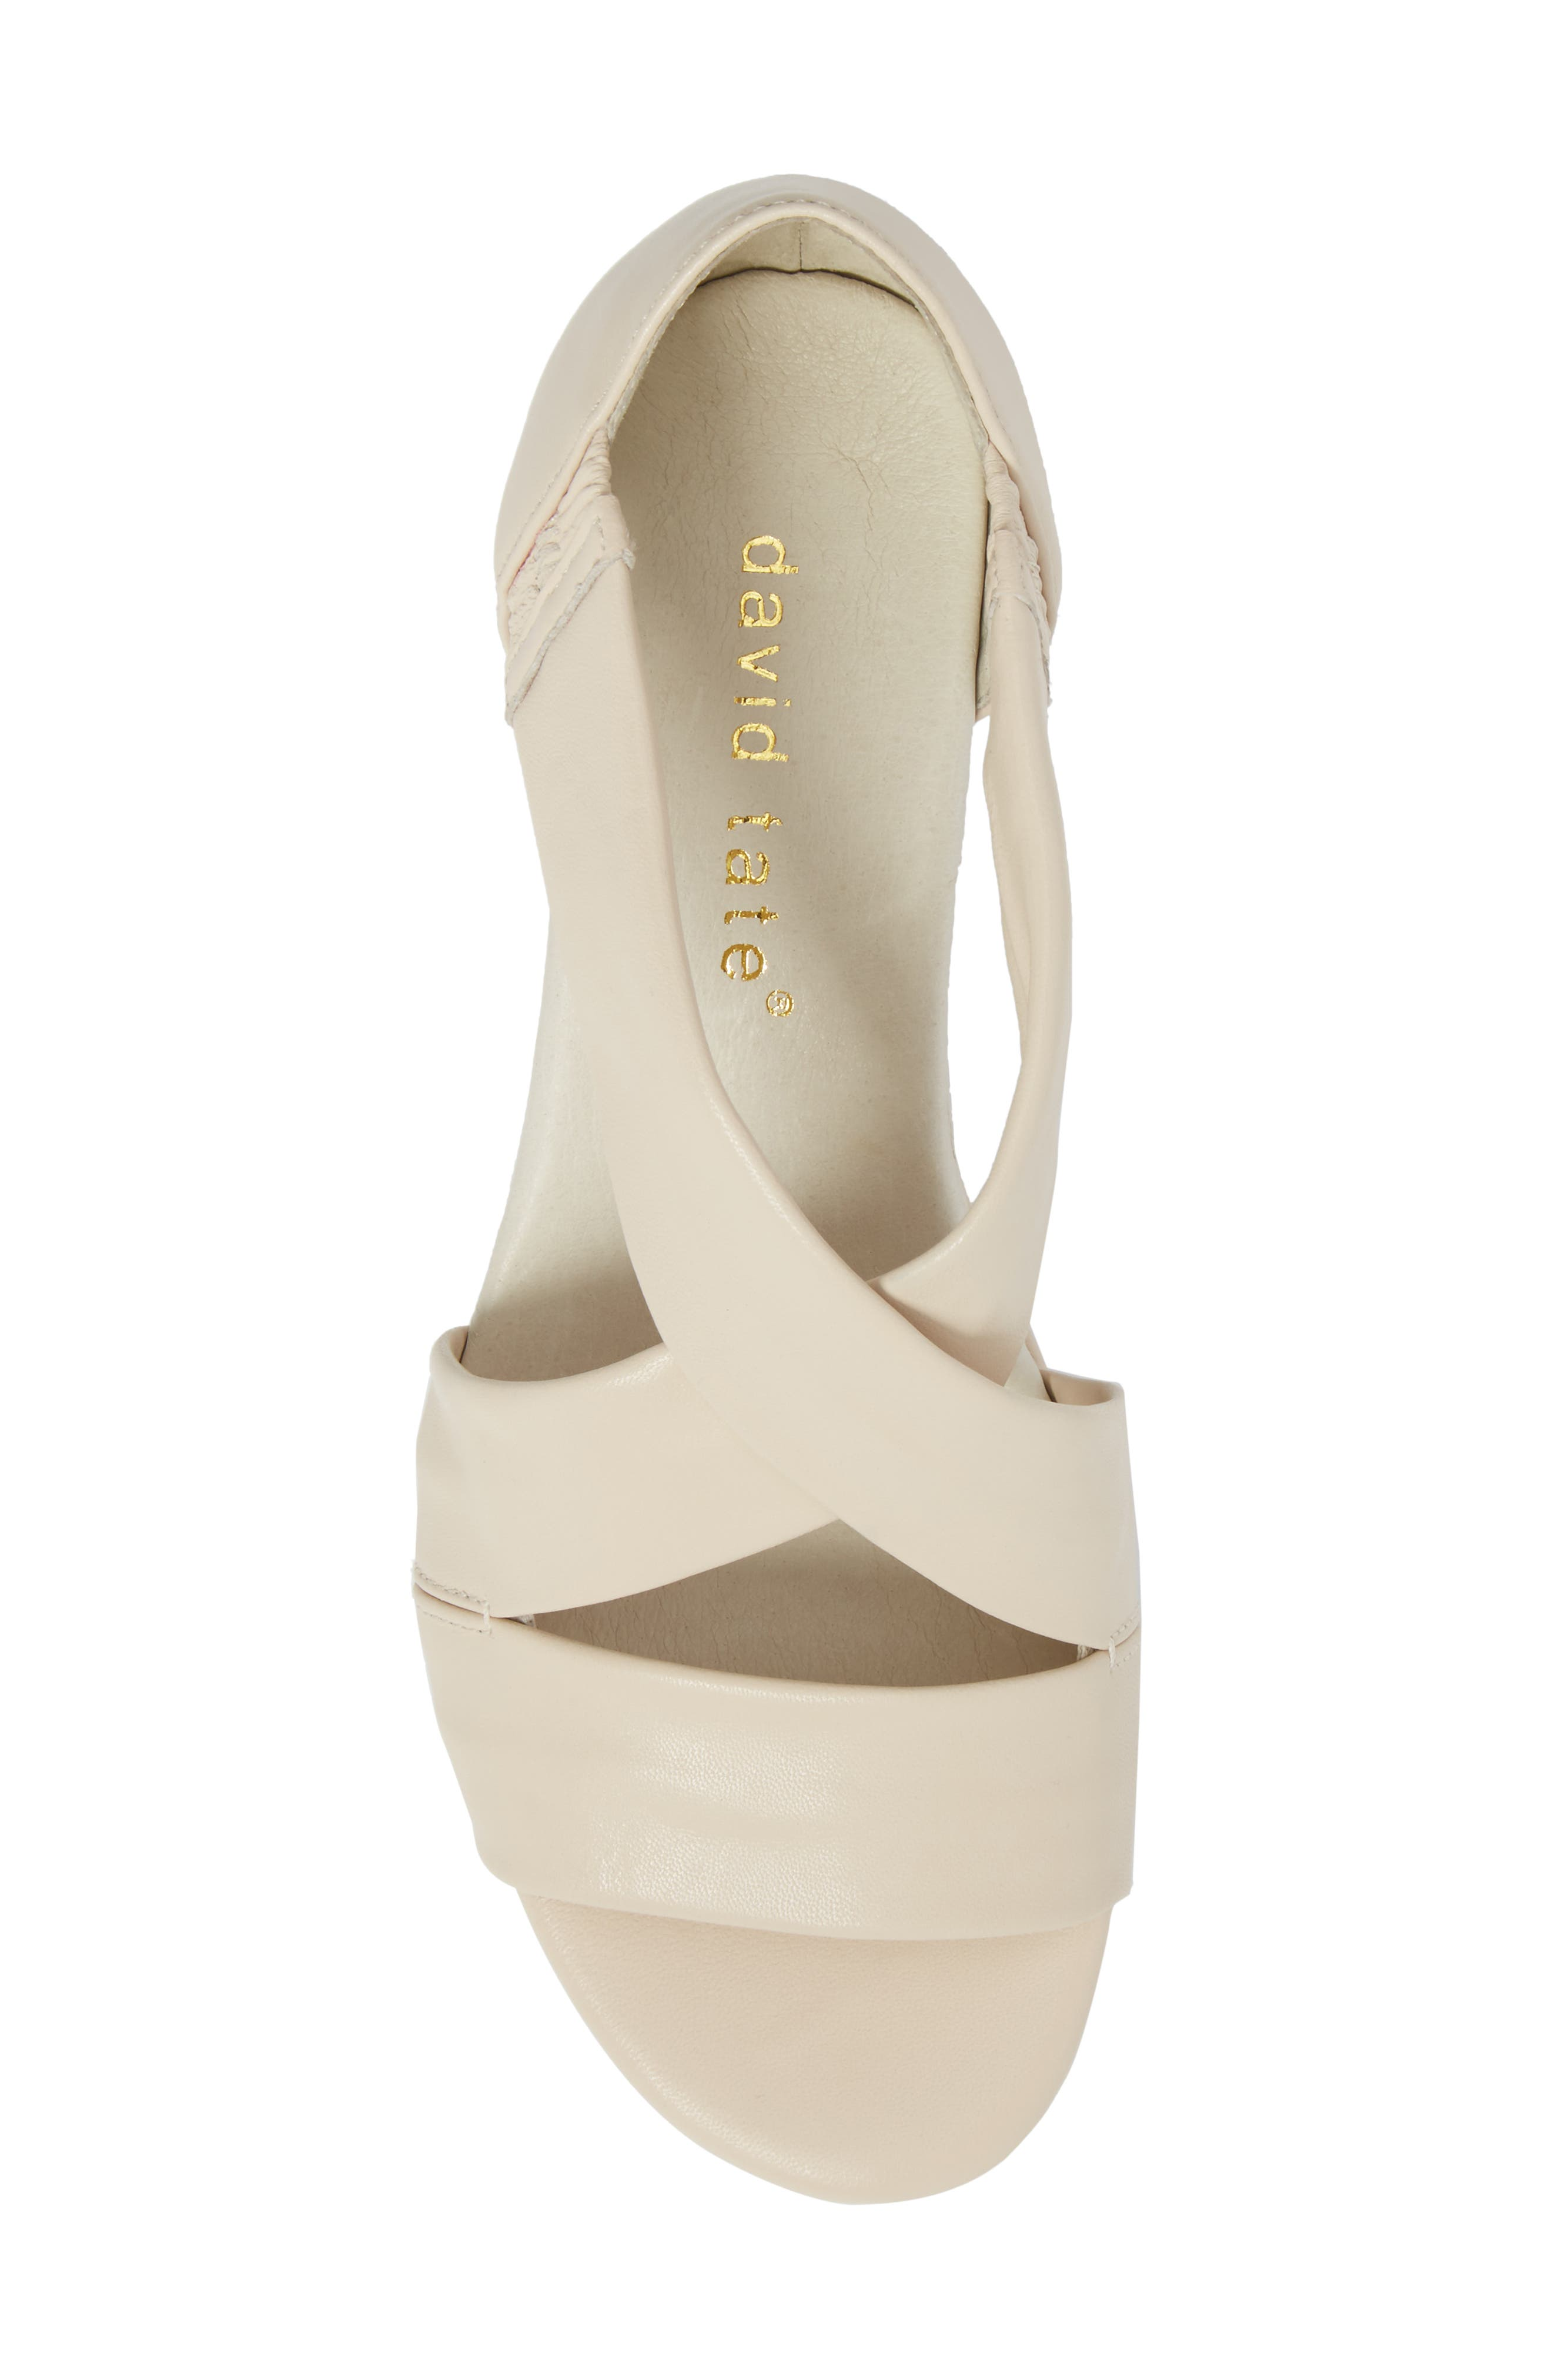 Swell Cross Strap Wedge Sandal,                             Alternate thumbnail 5, color,                             Bone Leather